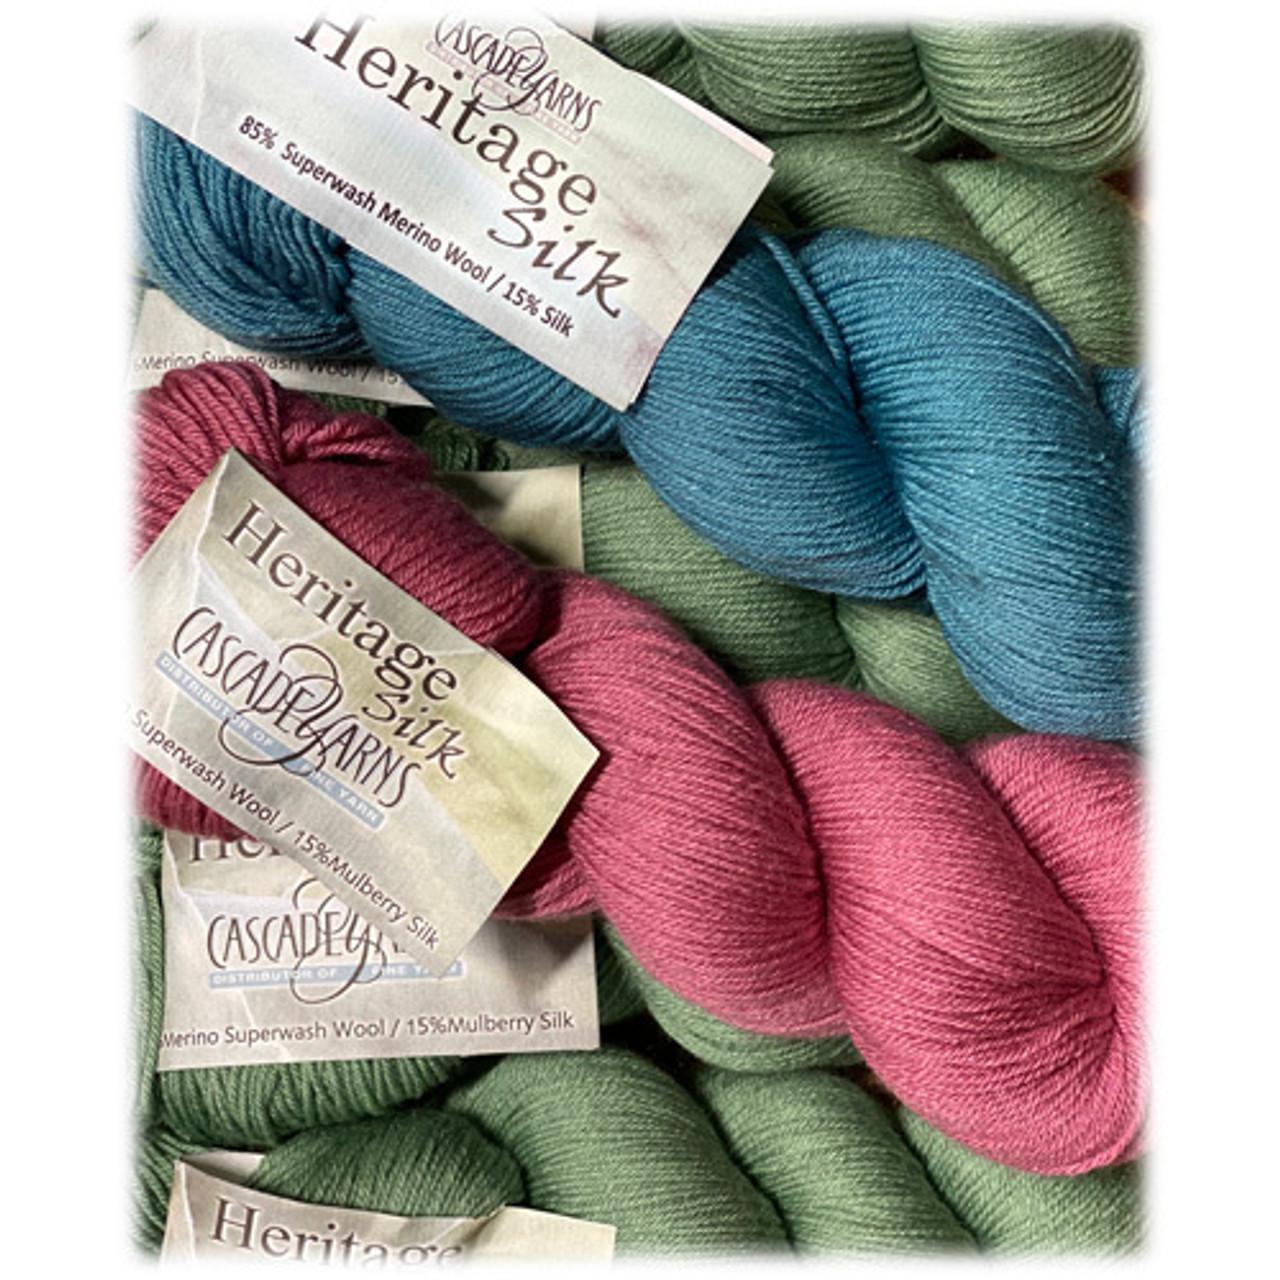 Cascade Yarns - Heritage Silk